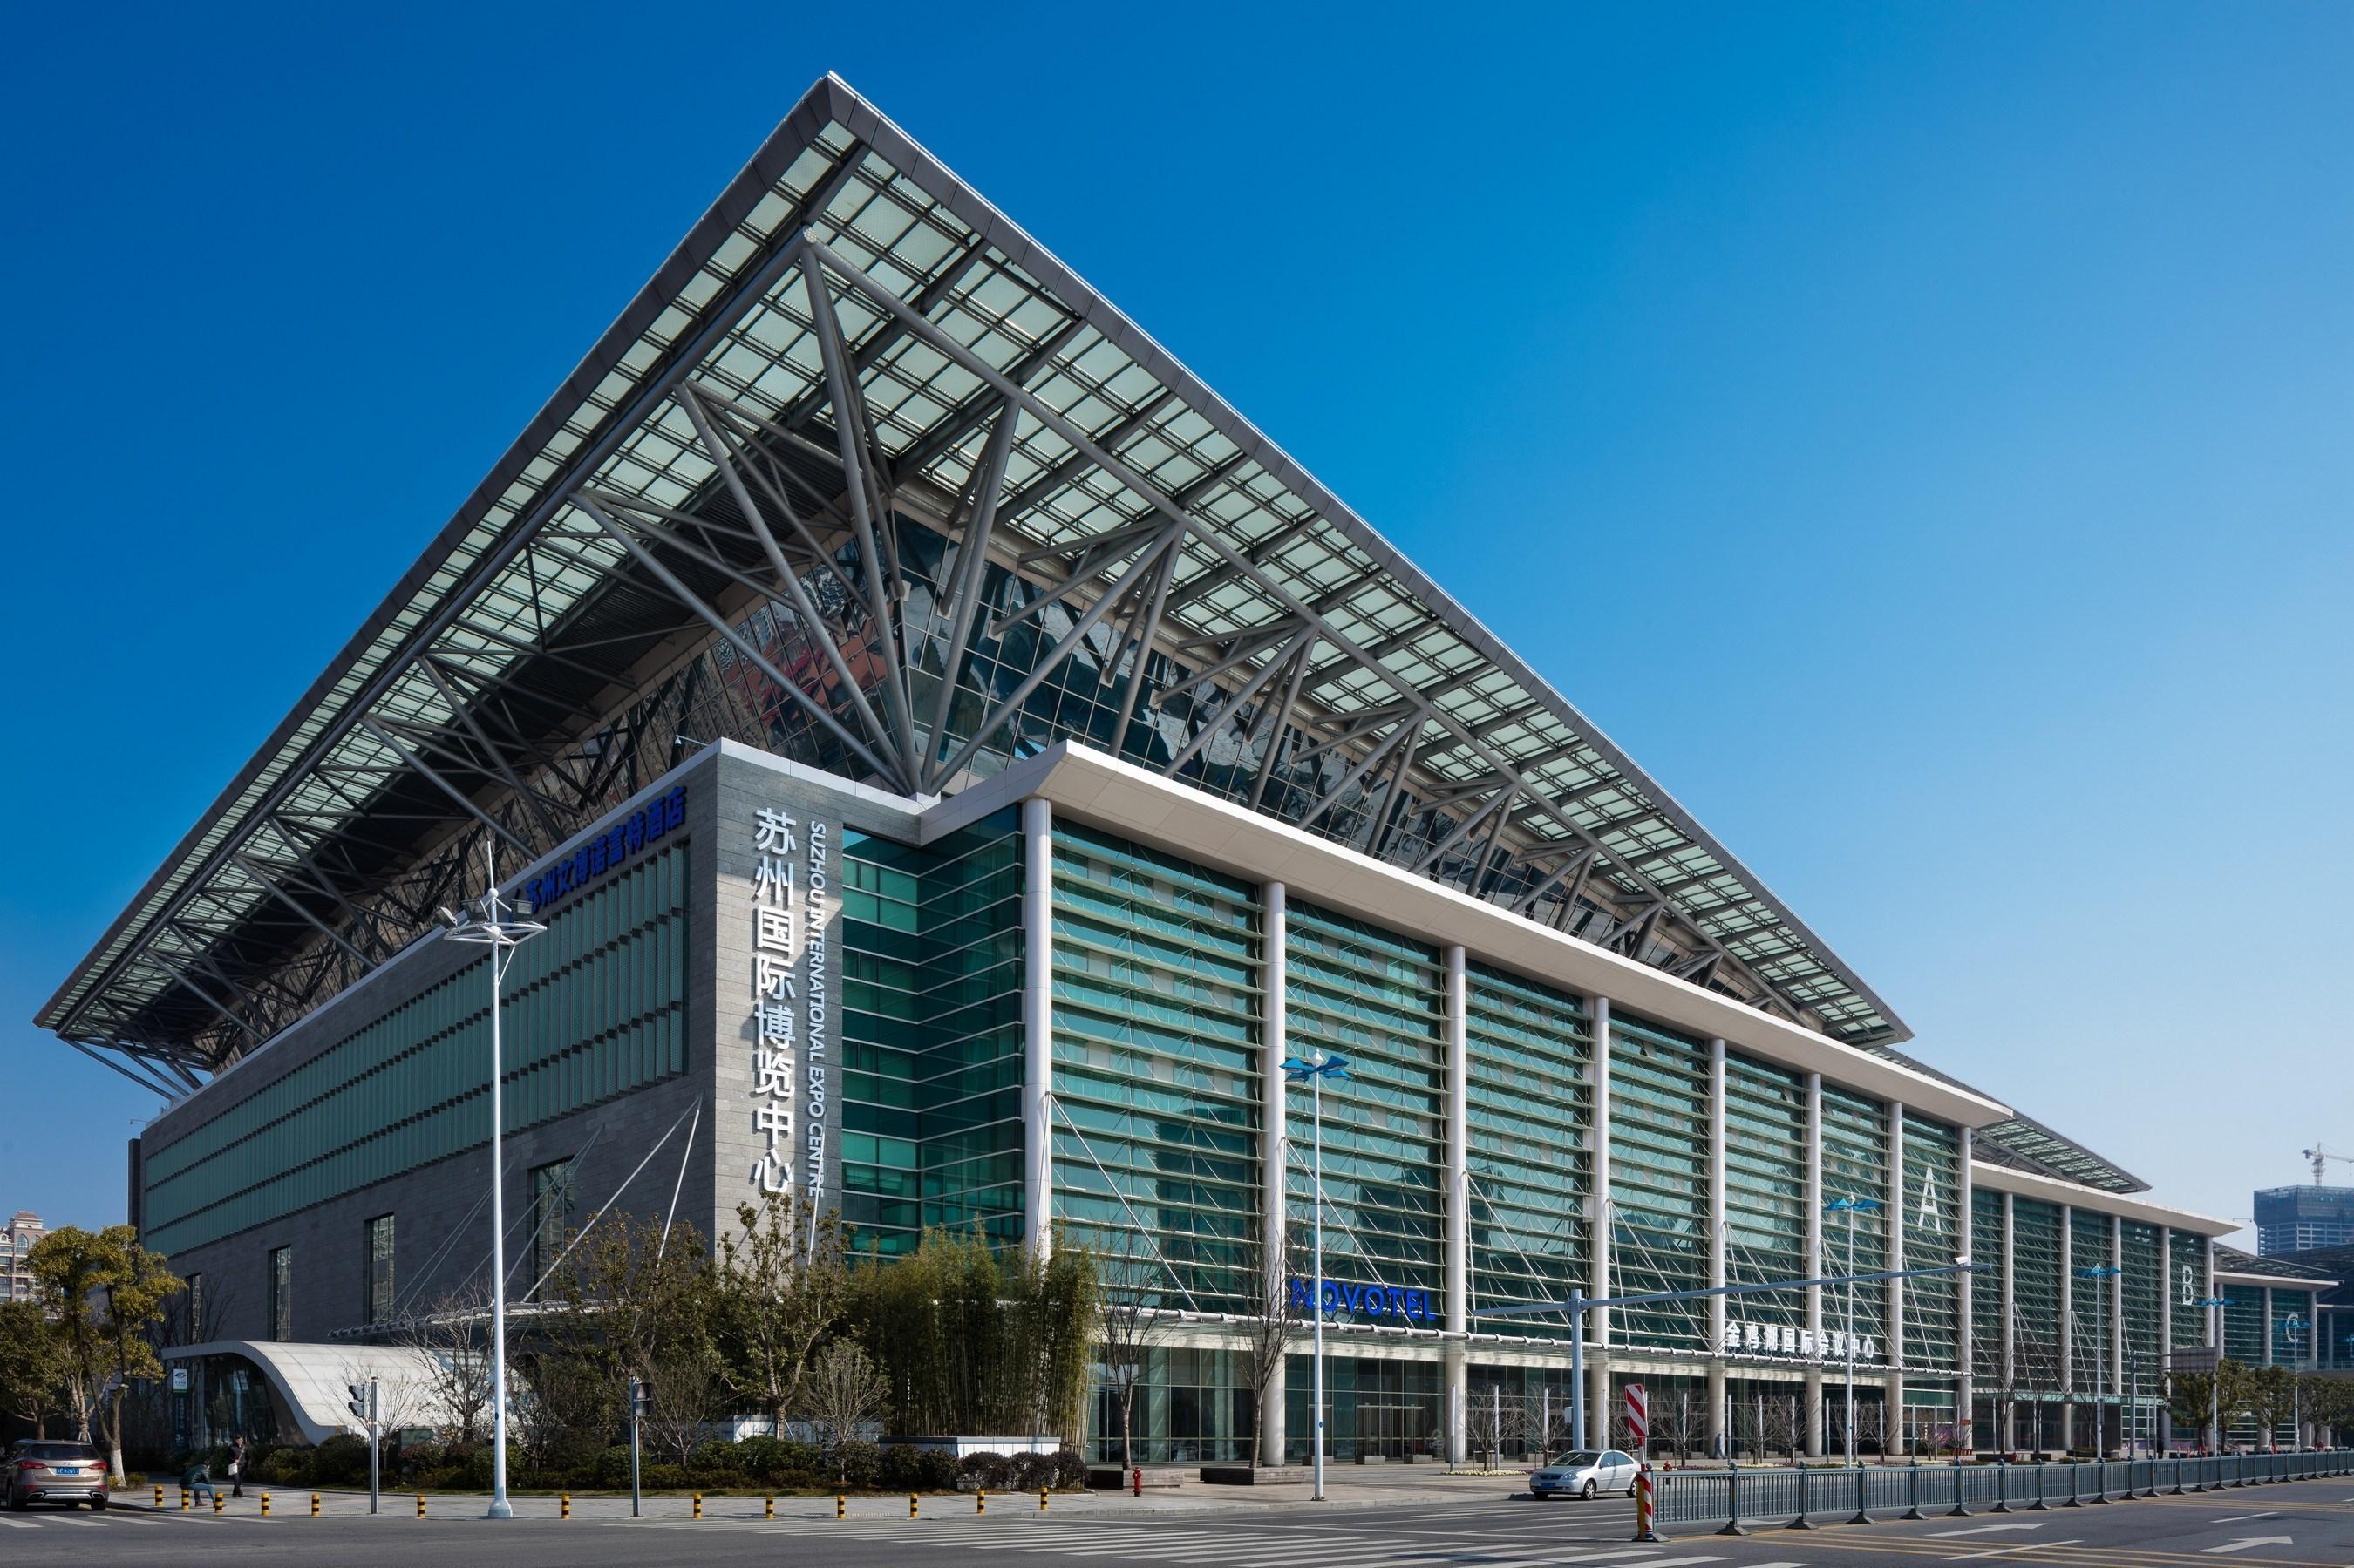 Suzhou Jinji Lake International Convention Center